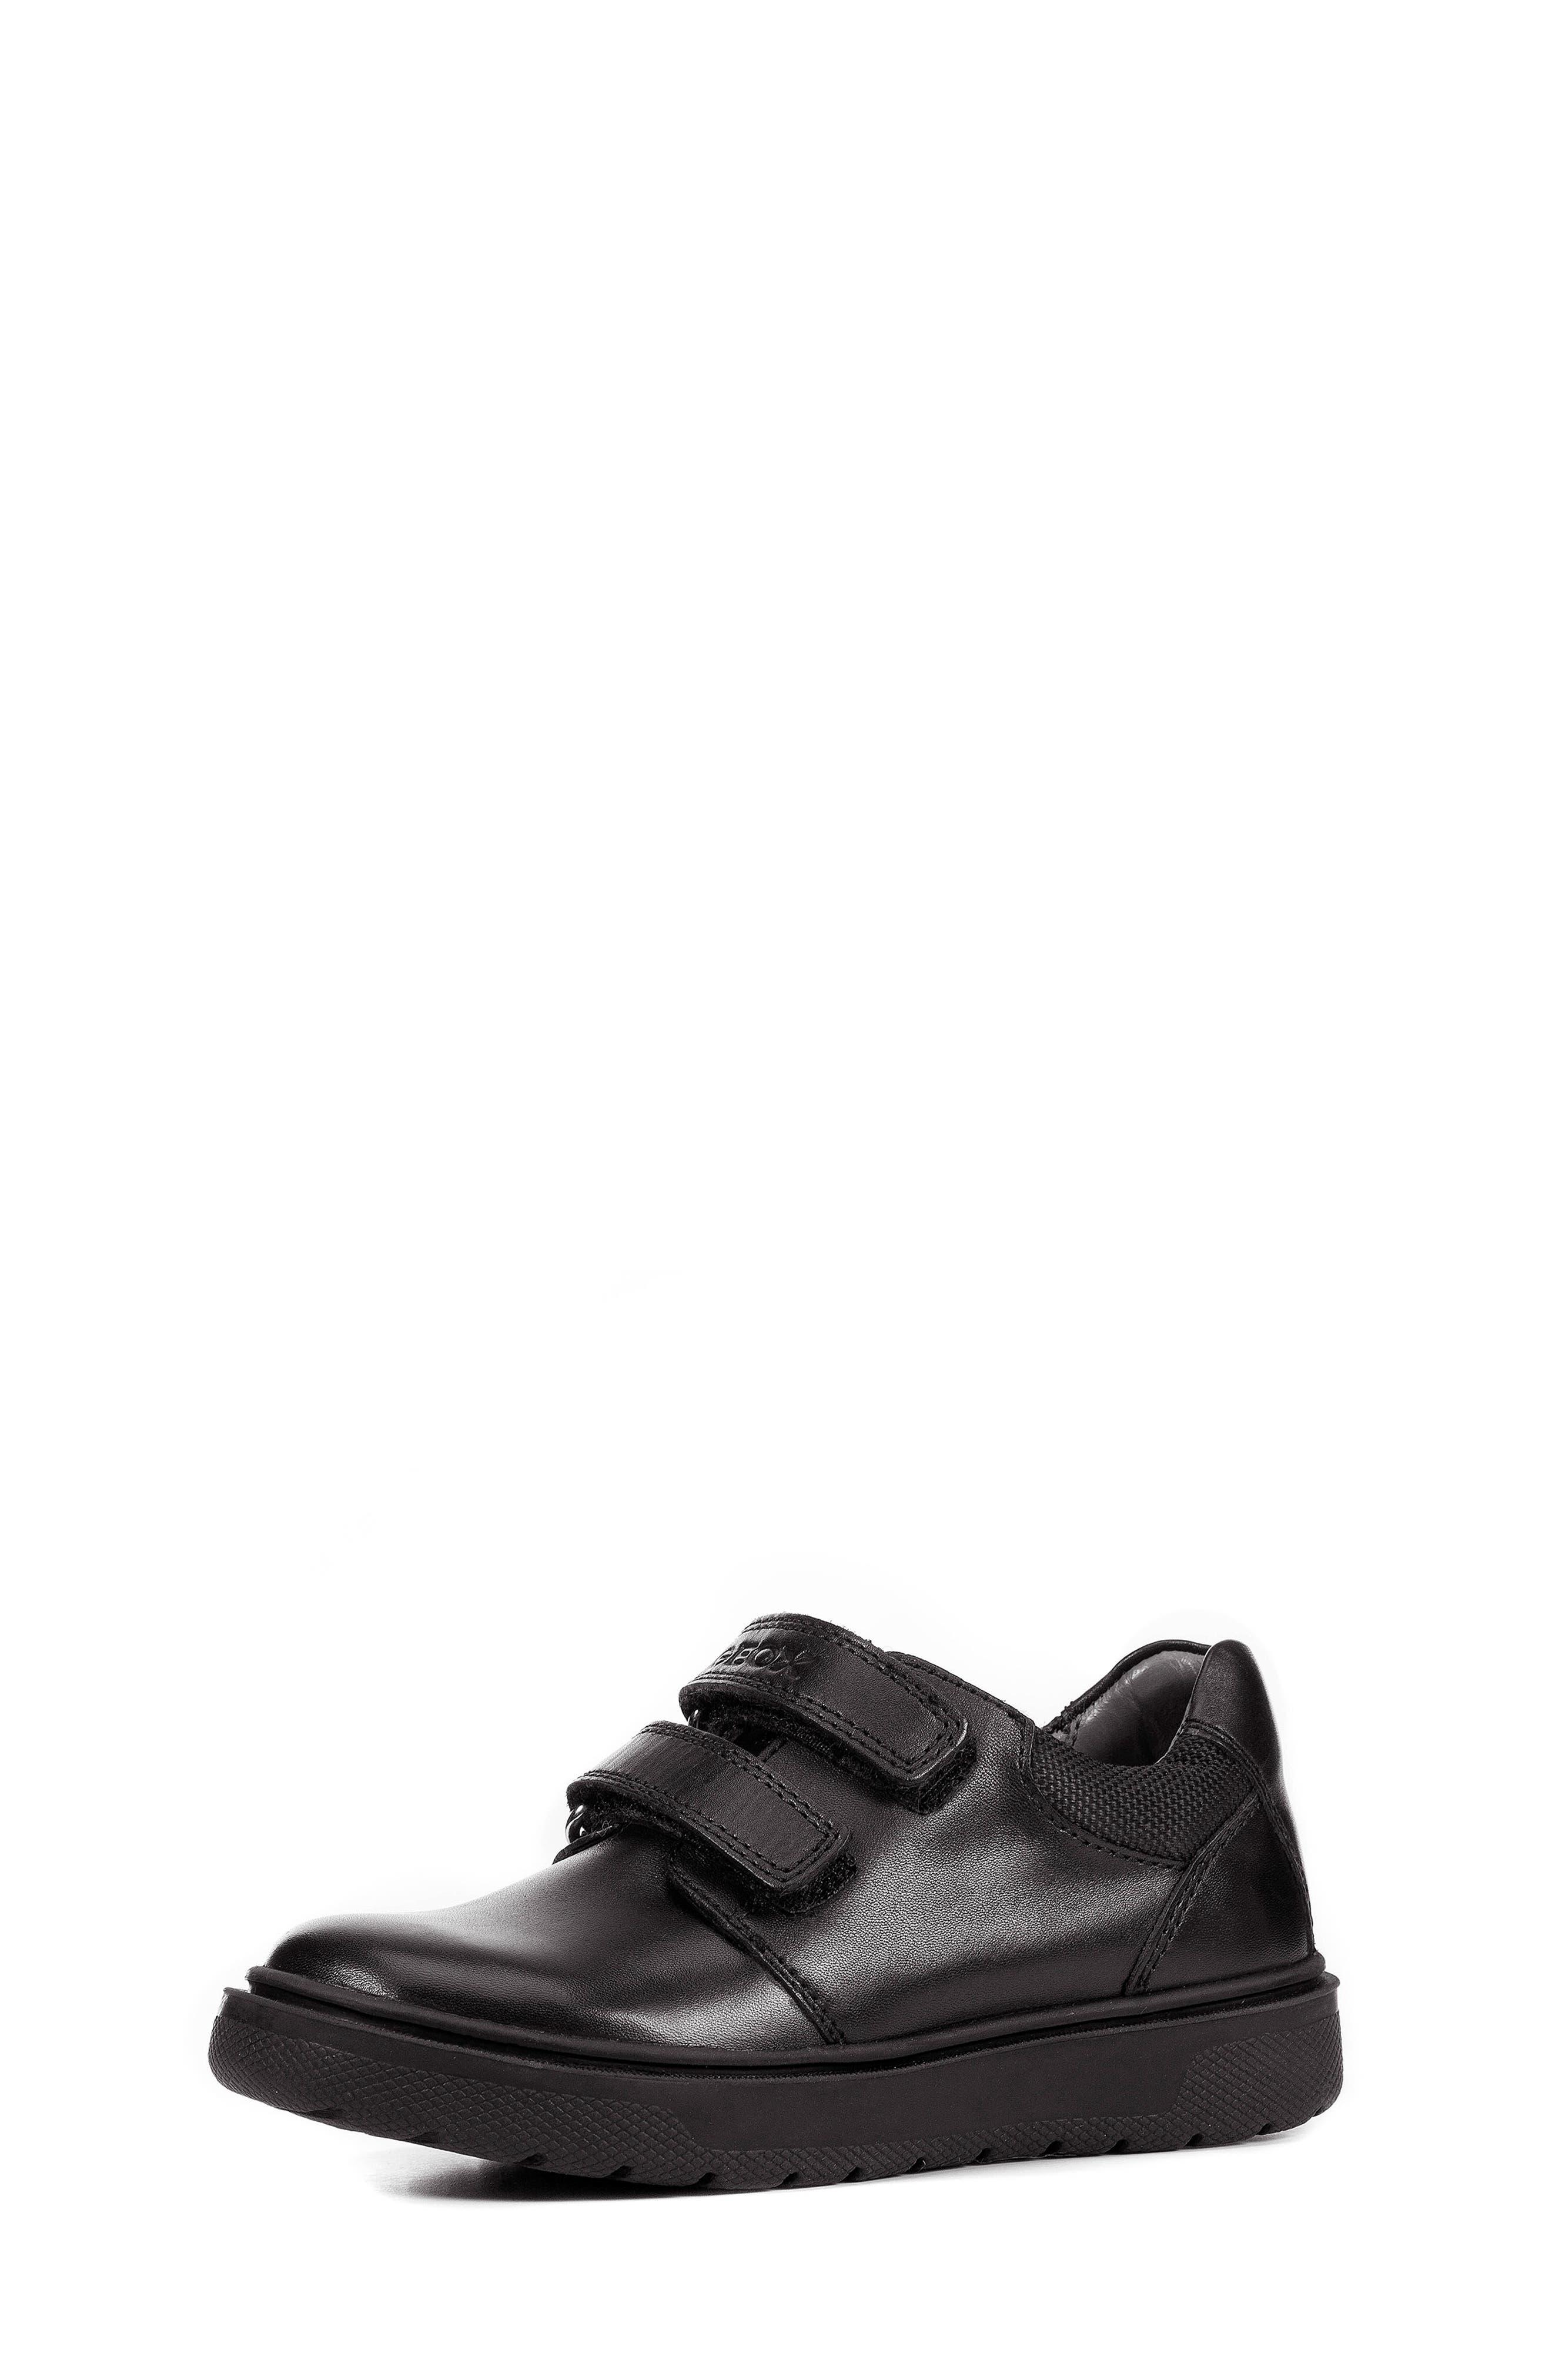 Riddock 5 Sneaker,                         Main,                         color, BLACK